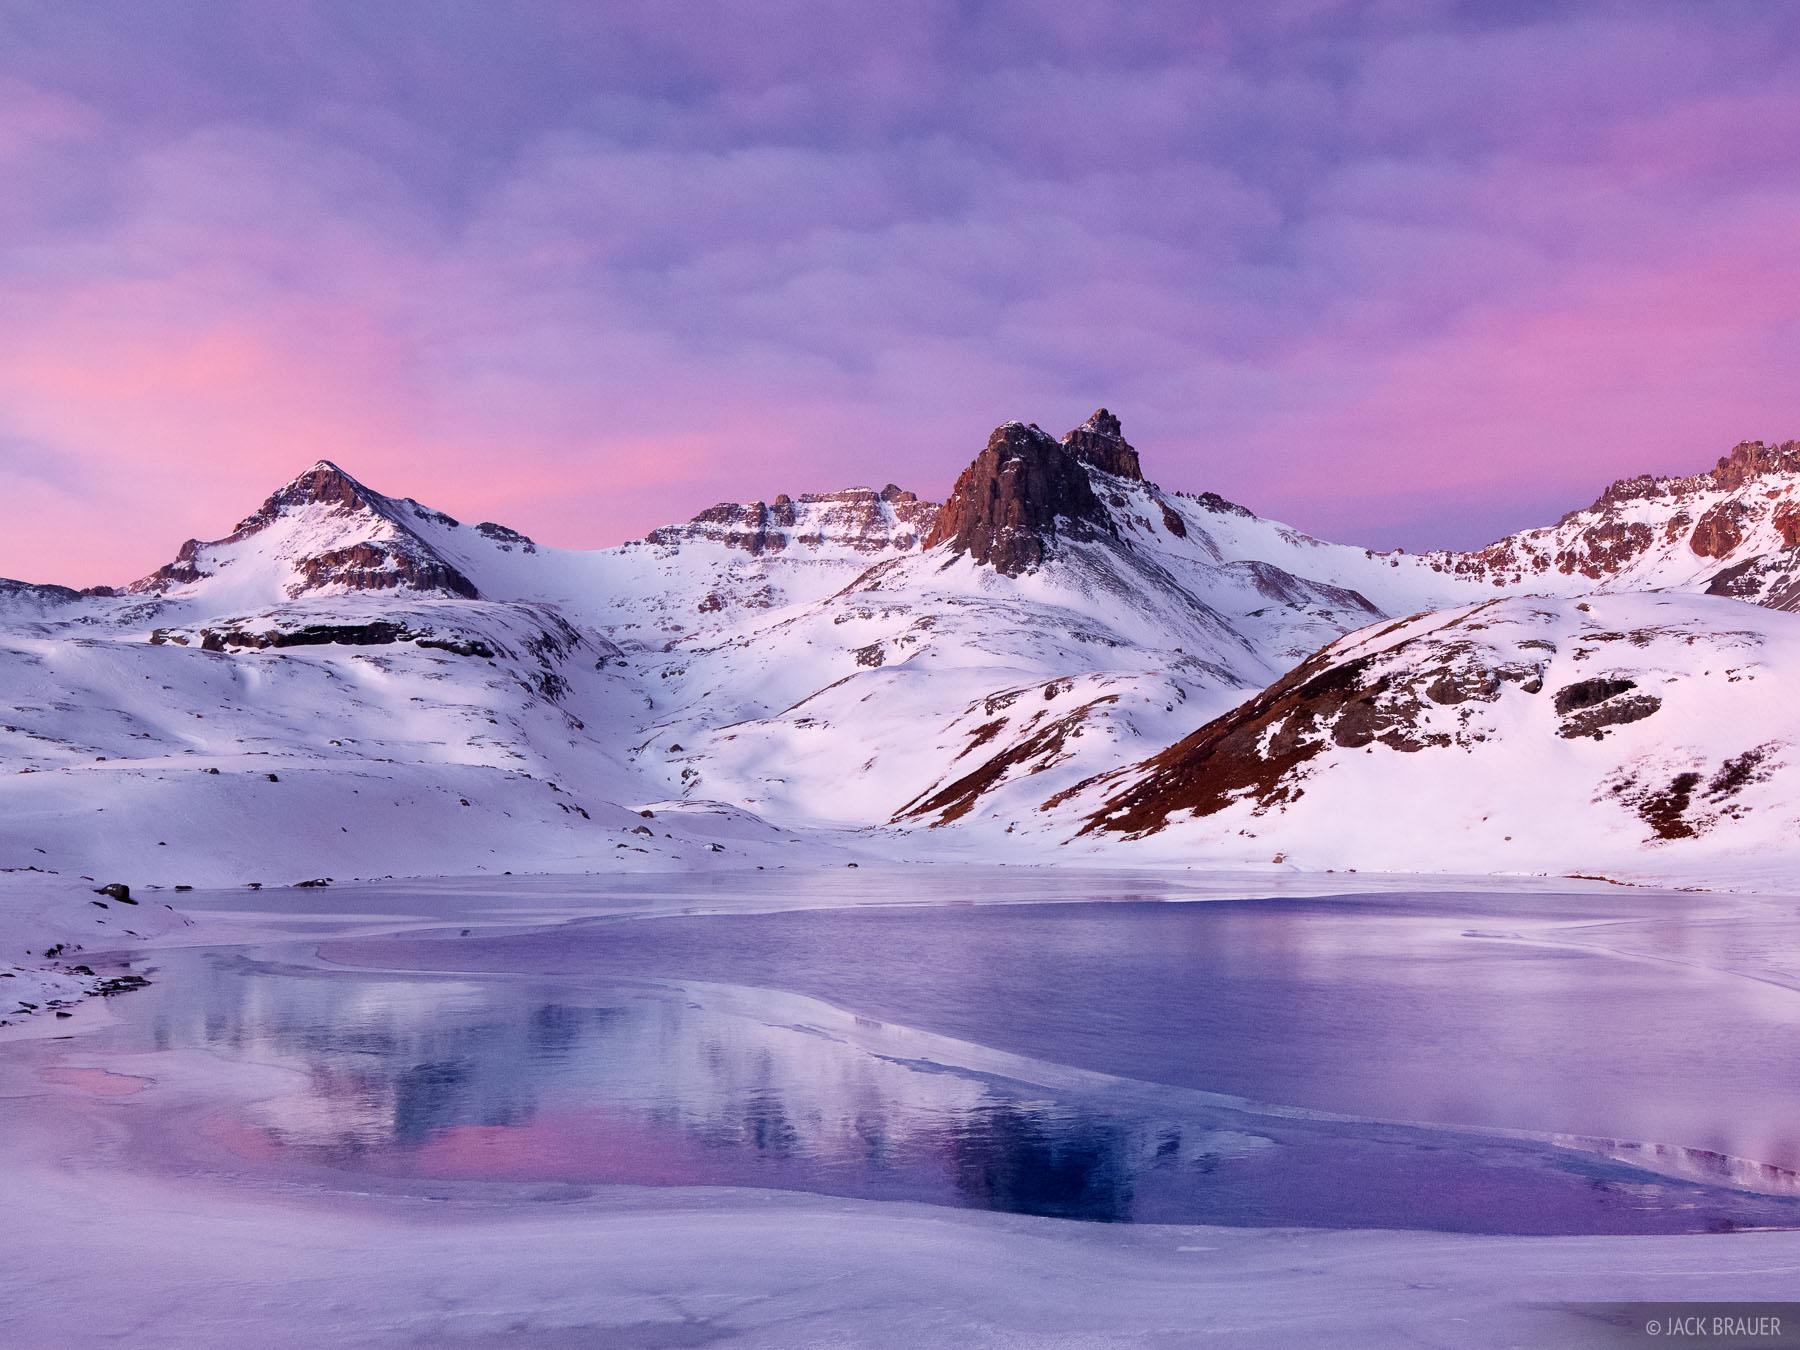 Ice Lakes Basin, sunrise, San Juan Mountains, Colorado, photo